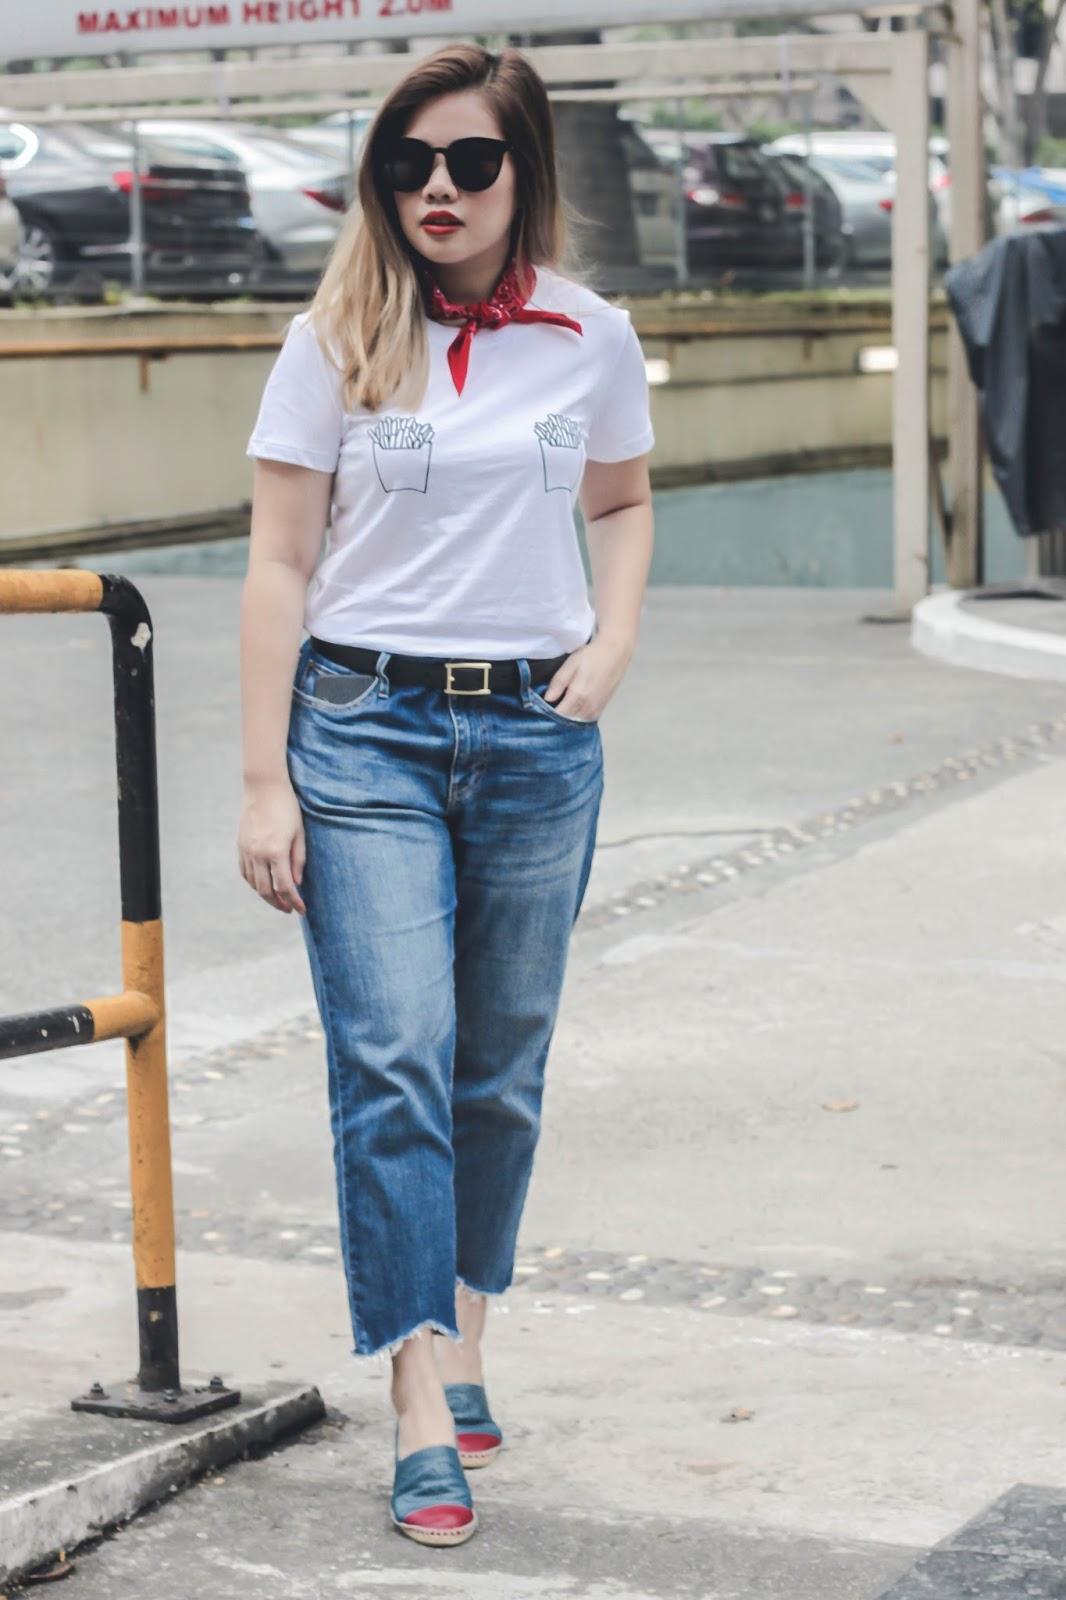 singapore blogger street style look book fashion bandana photography outfit denim tees